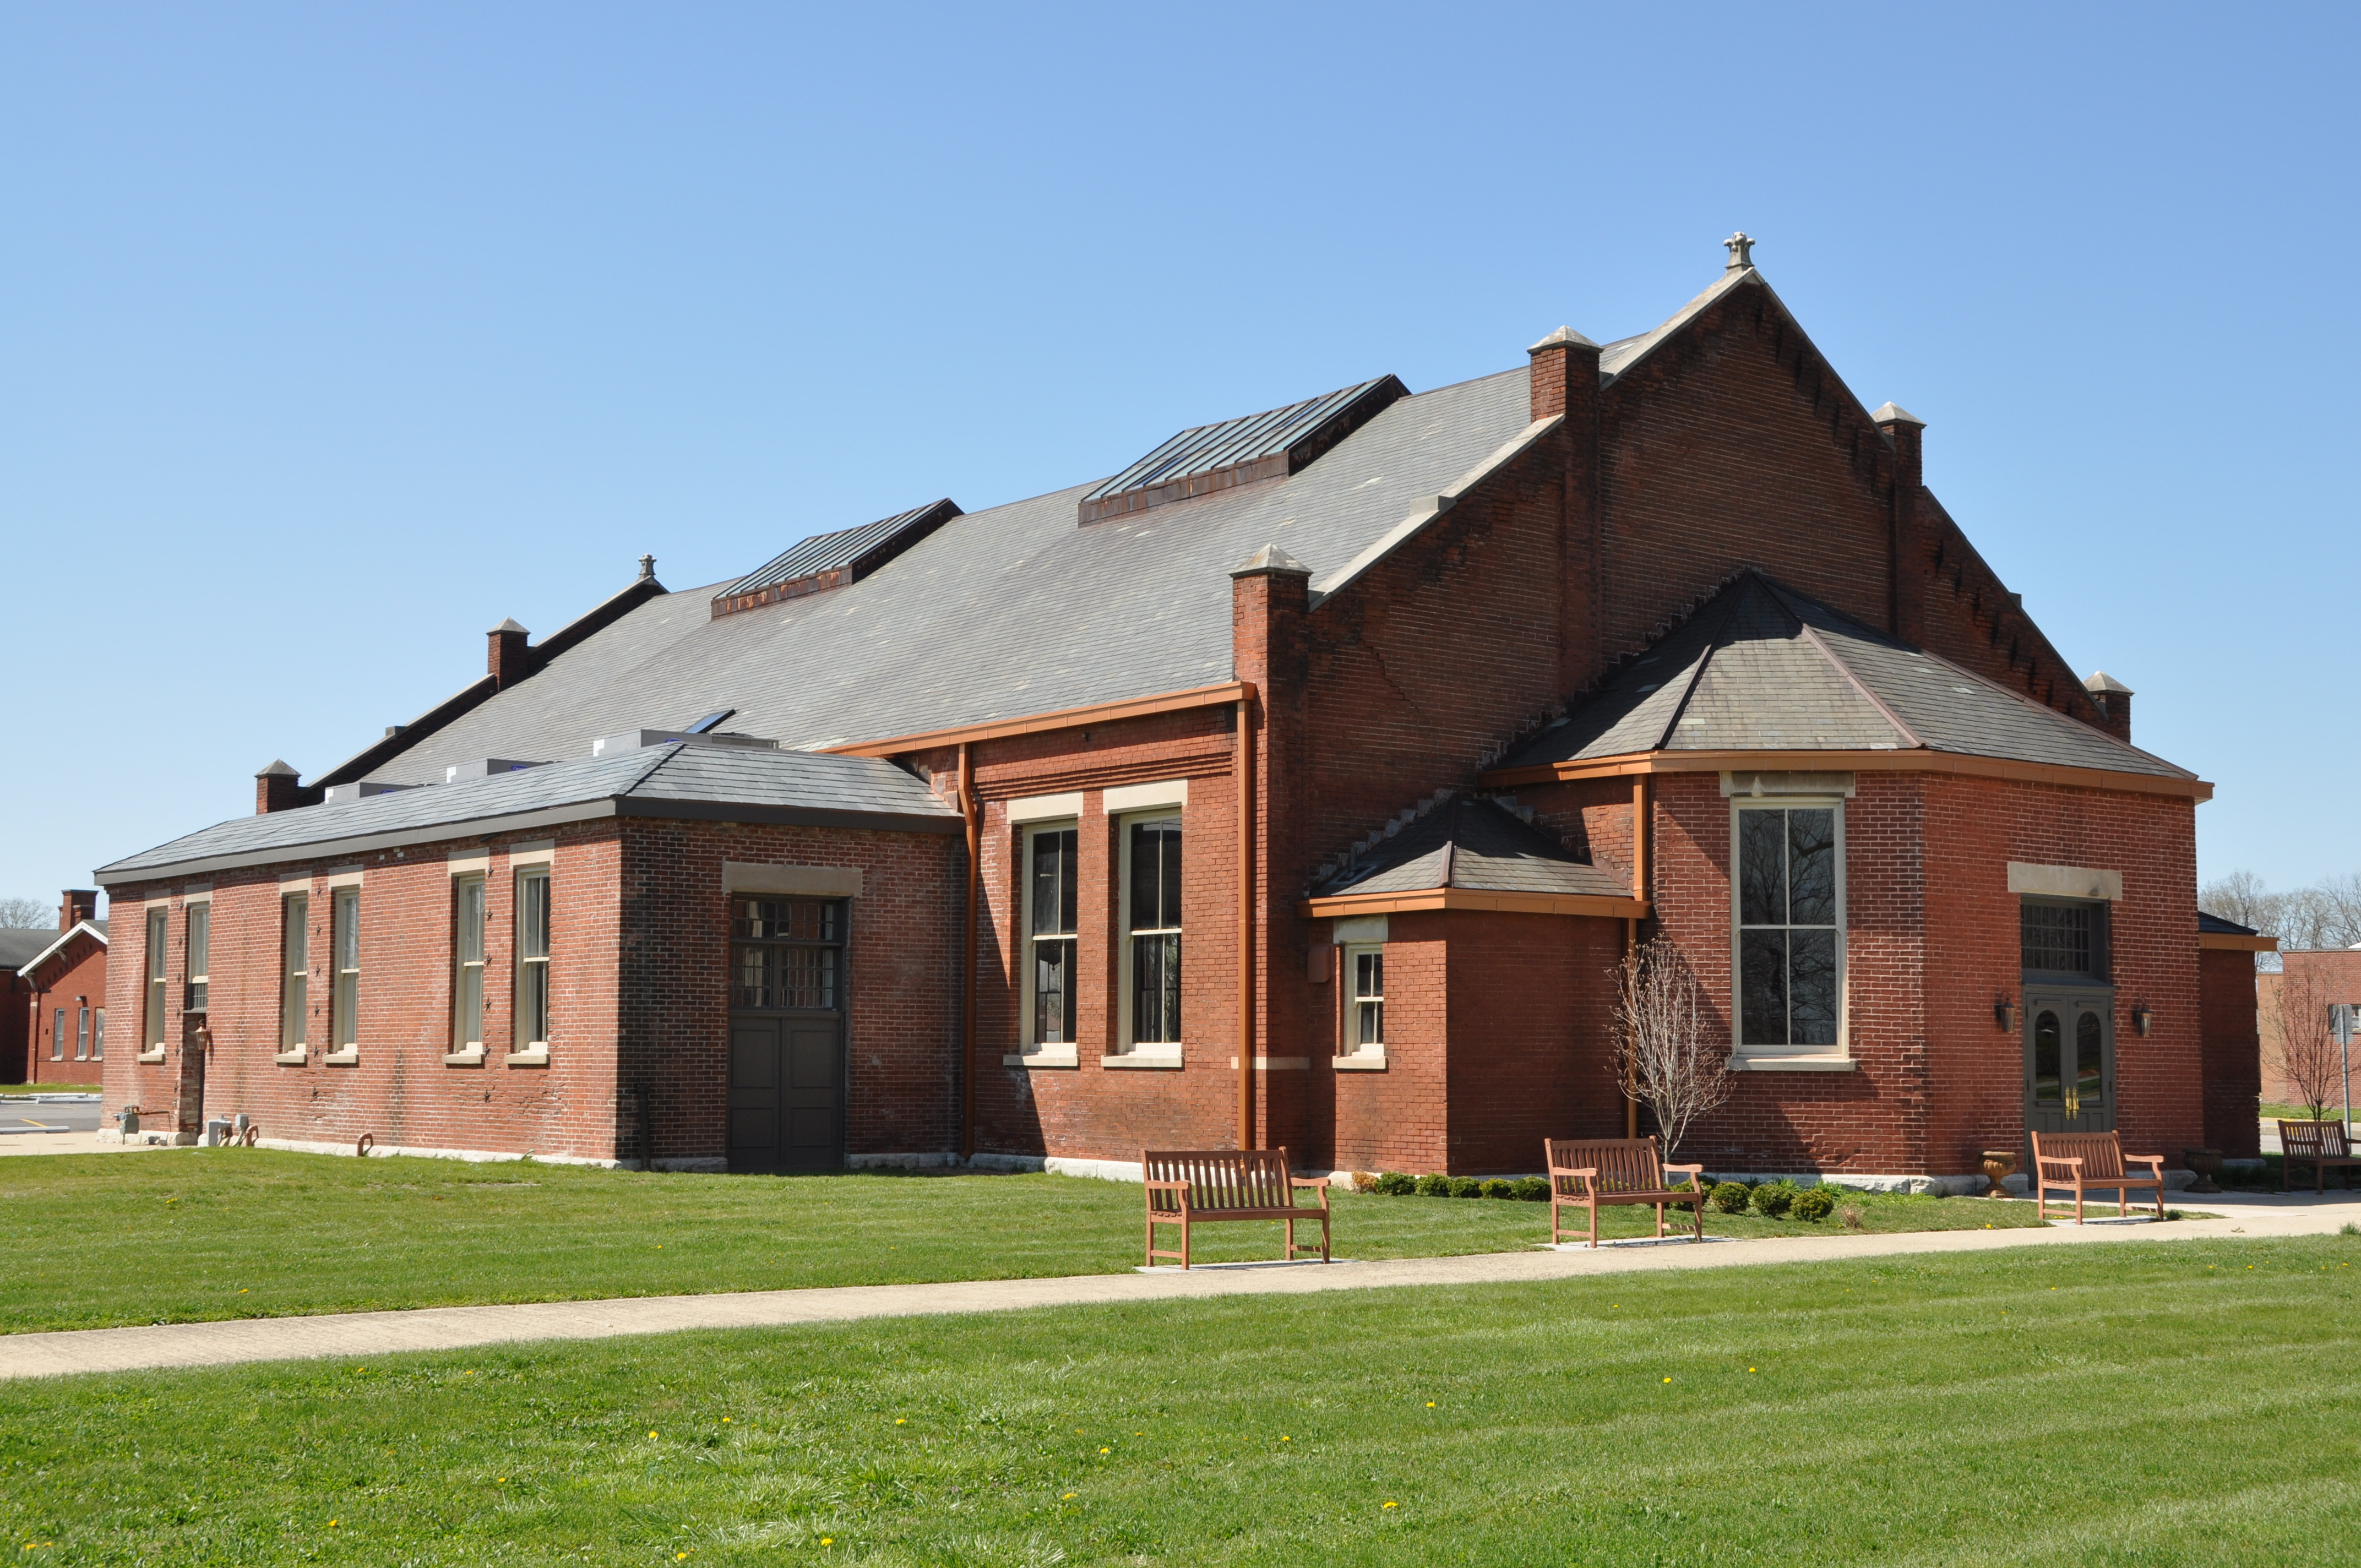 1899 Building at former Central State Hospital